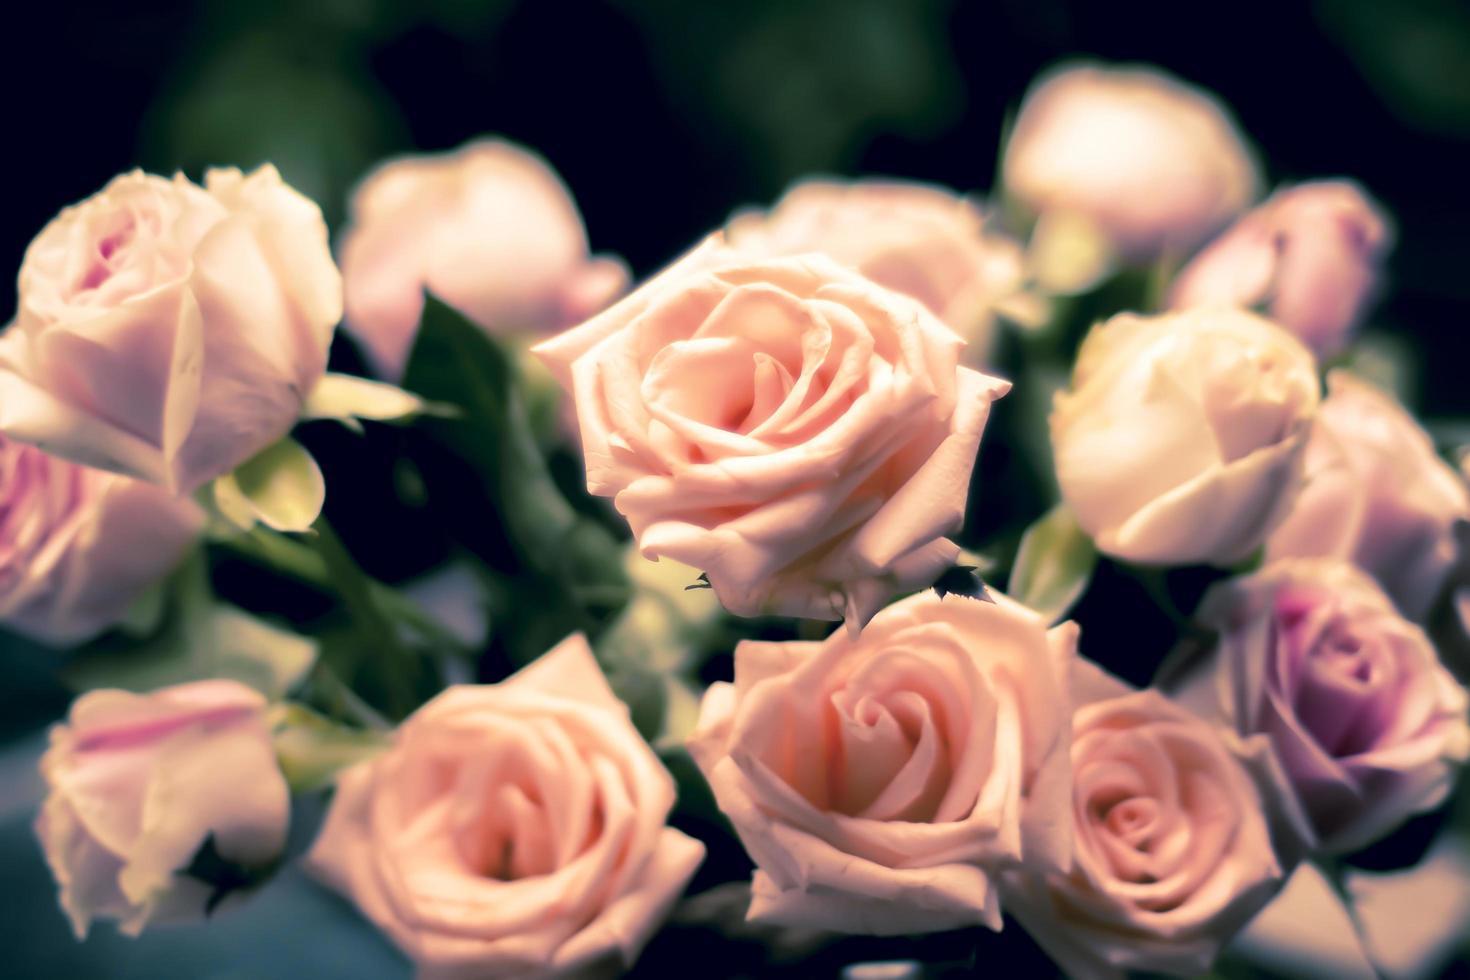 rosa rosor som bakgrund. foto